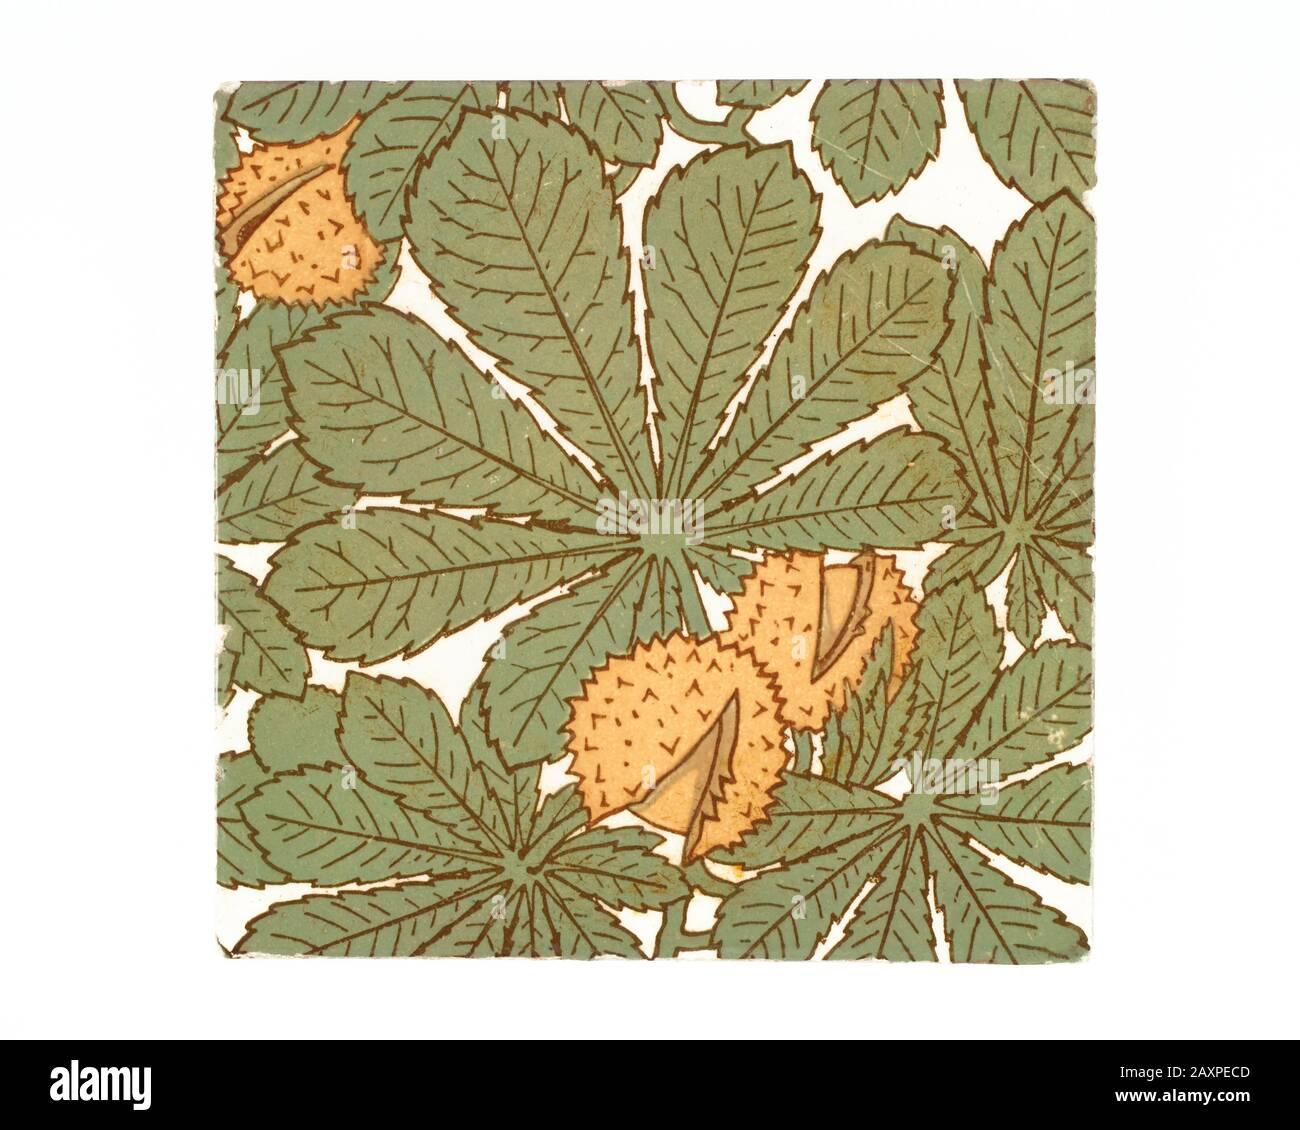 Antique 1880s Minton Aesthetic Movement Horse Chestnut Pottery Tile Stock Photo Alamy